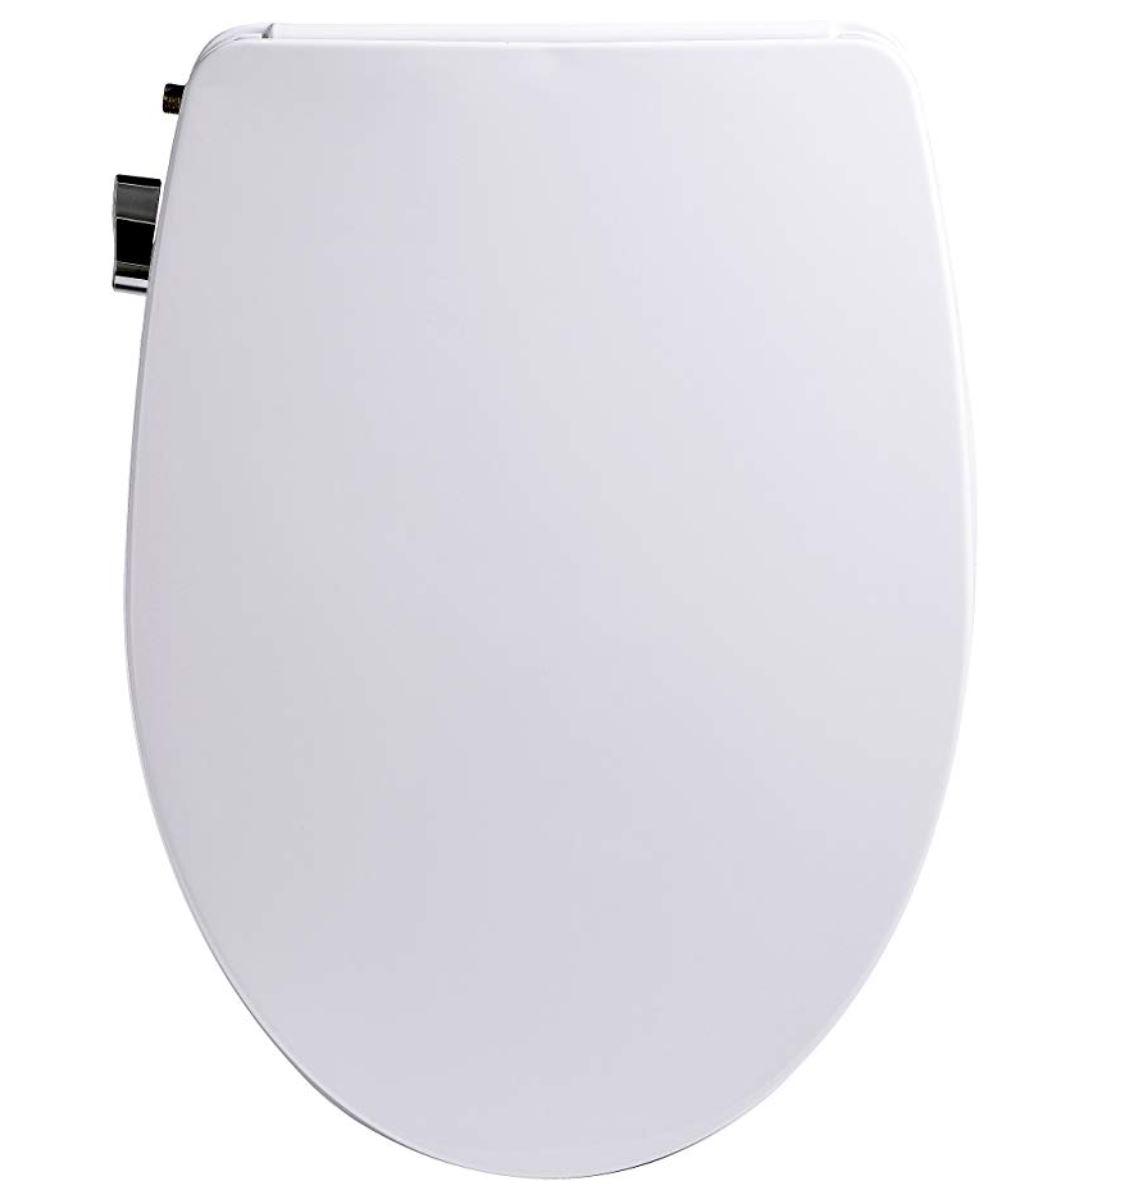 Bio Bidet Slim Zero-Non Electric Bidet Seat for Elongated Toilet via Amazon